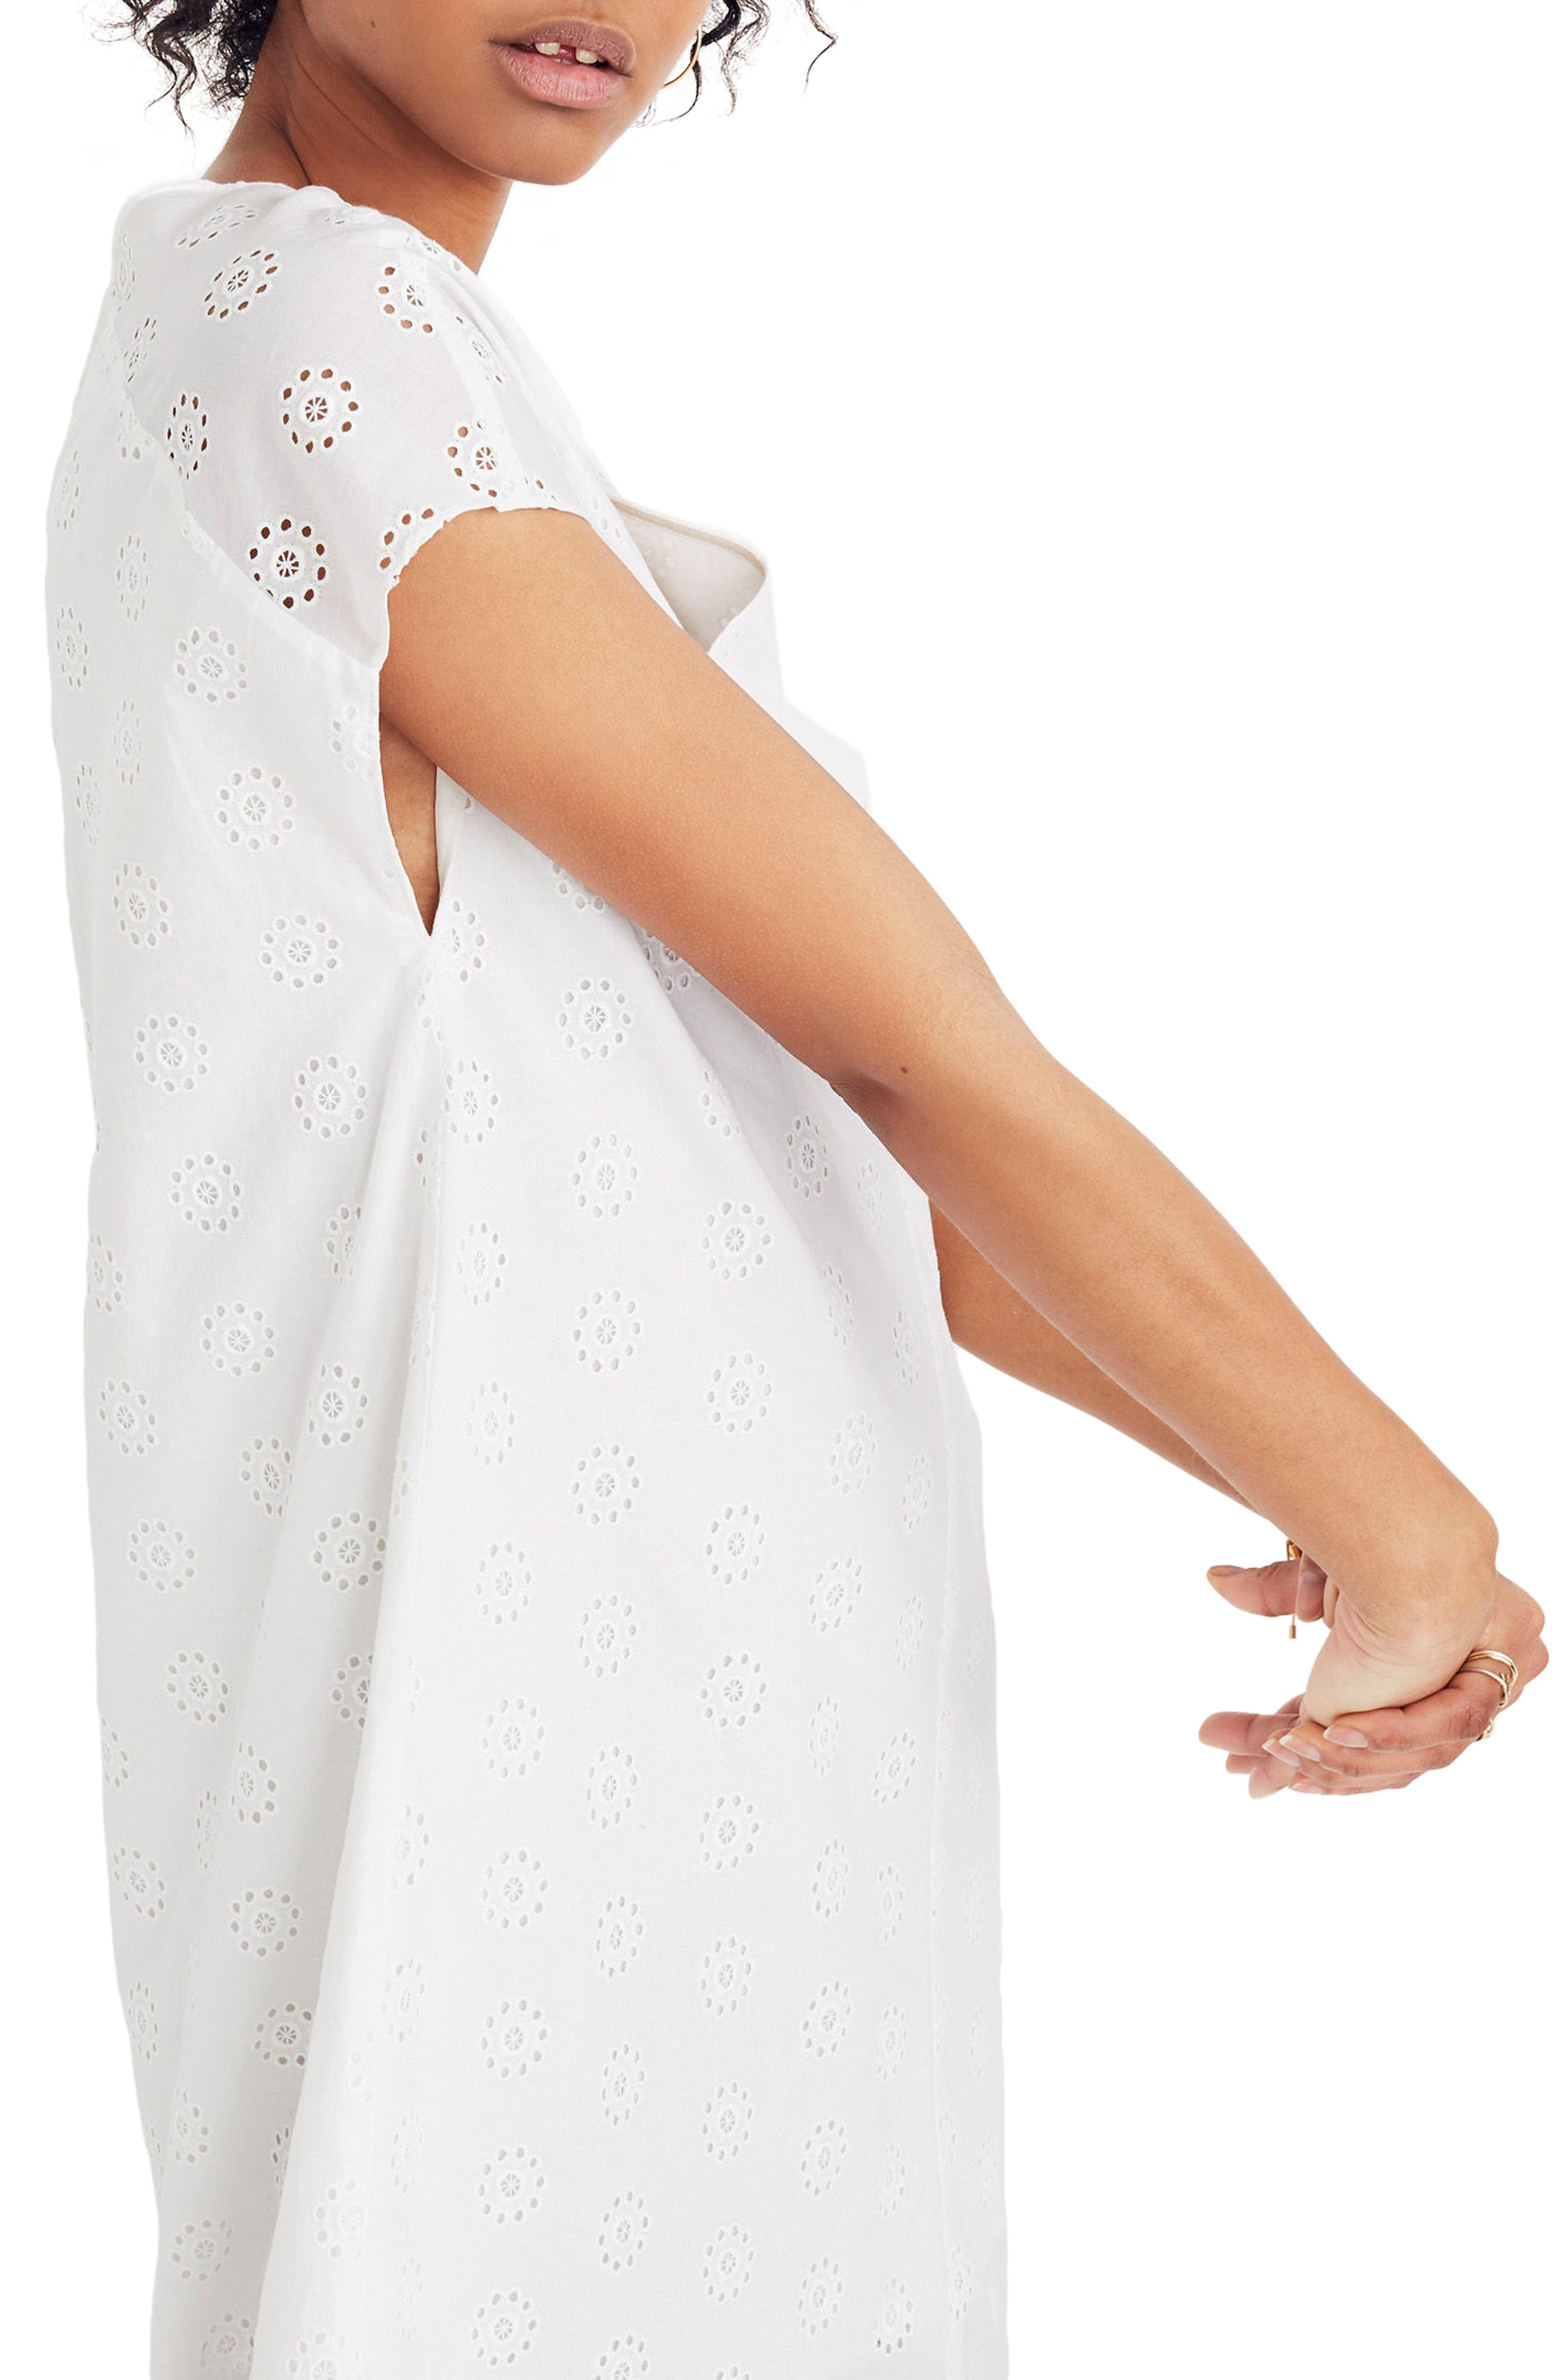 Clipdot Midi Shirtdress,                             Alternate thumbnail 3, color,                             EYELET WHITE